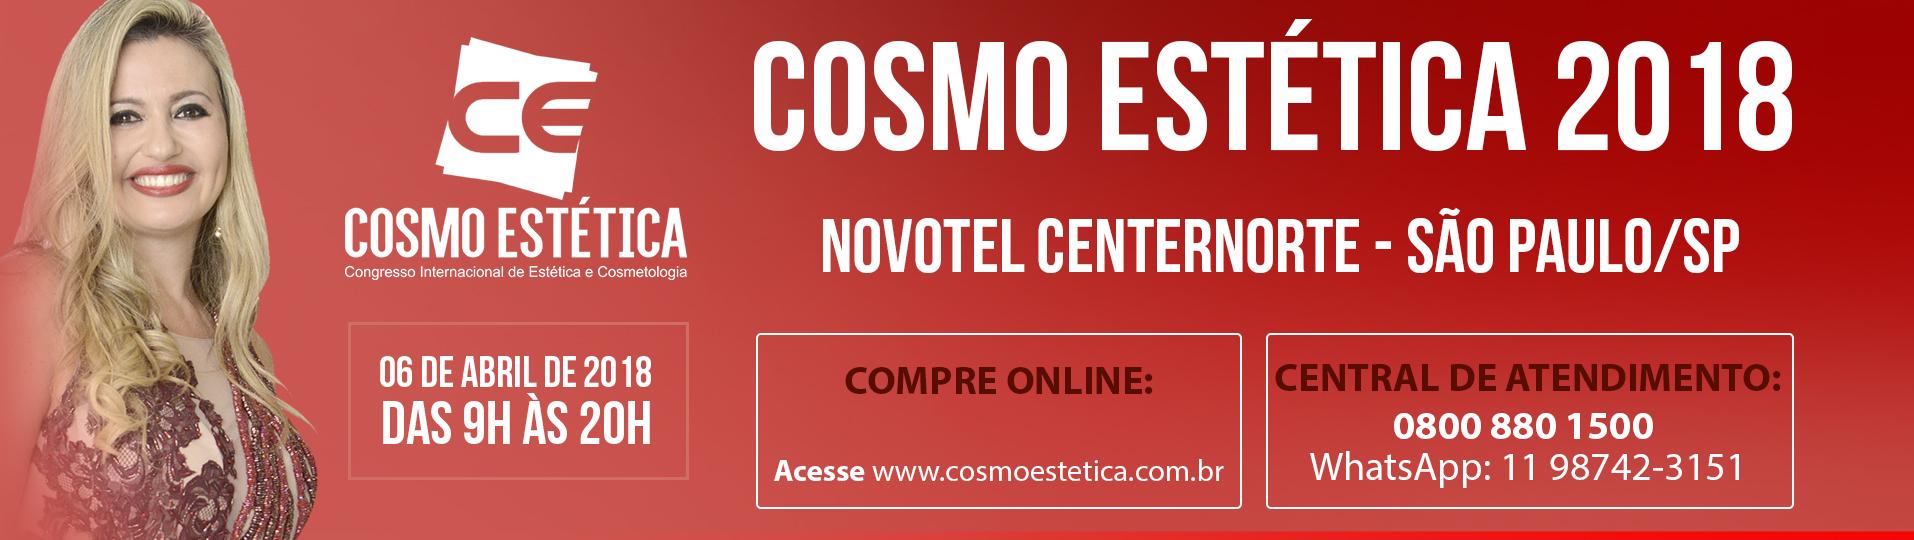 cosmoestetica-facebook1-1914×540